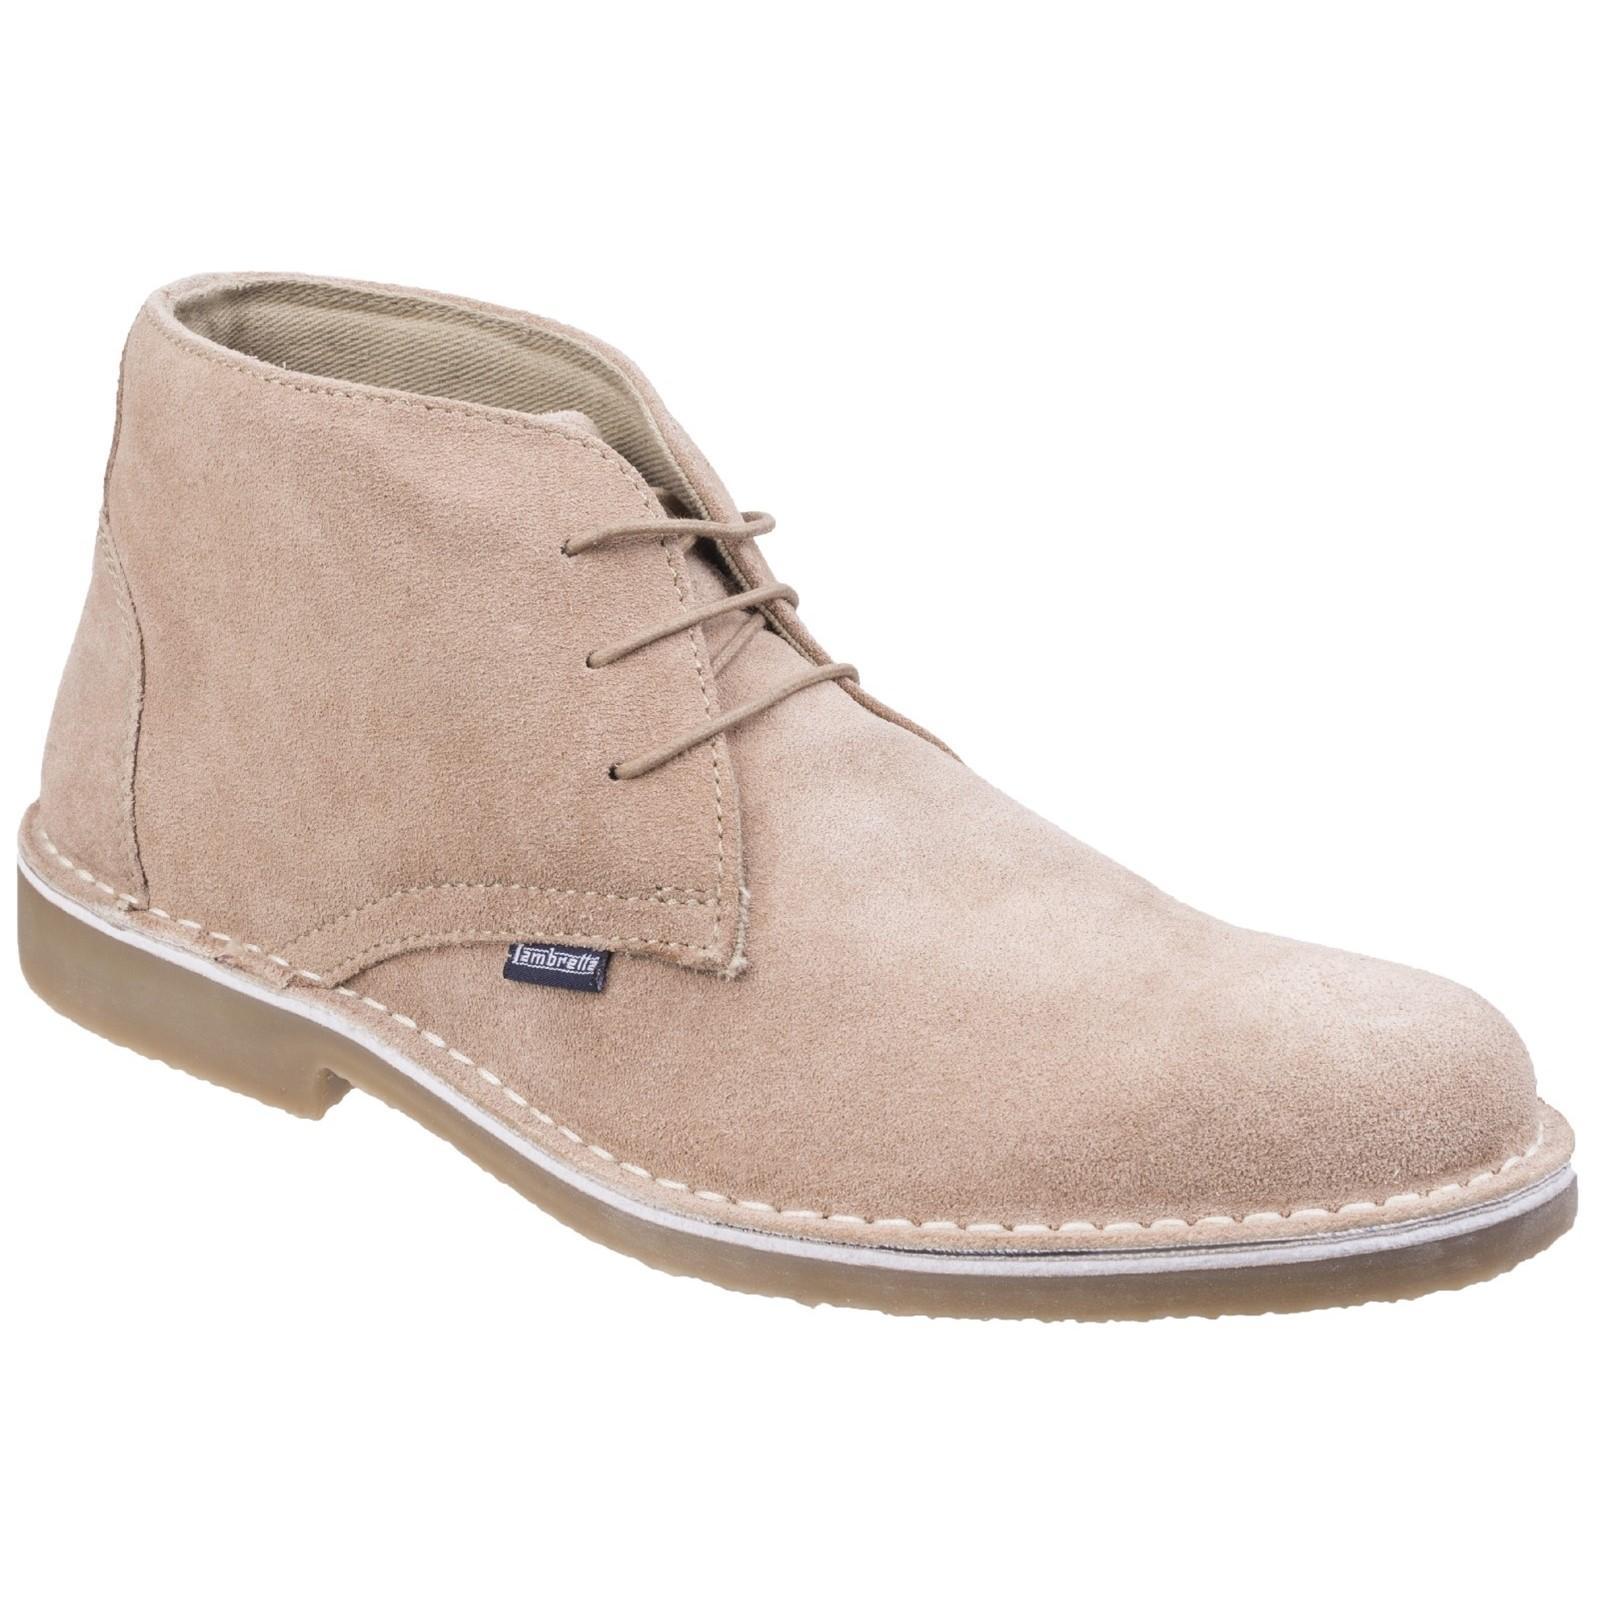 Lambretta Mens Canary II Desert Boots (7 UK) (Beige)